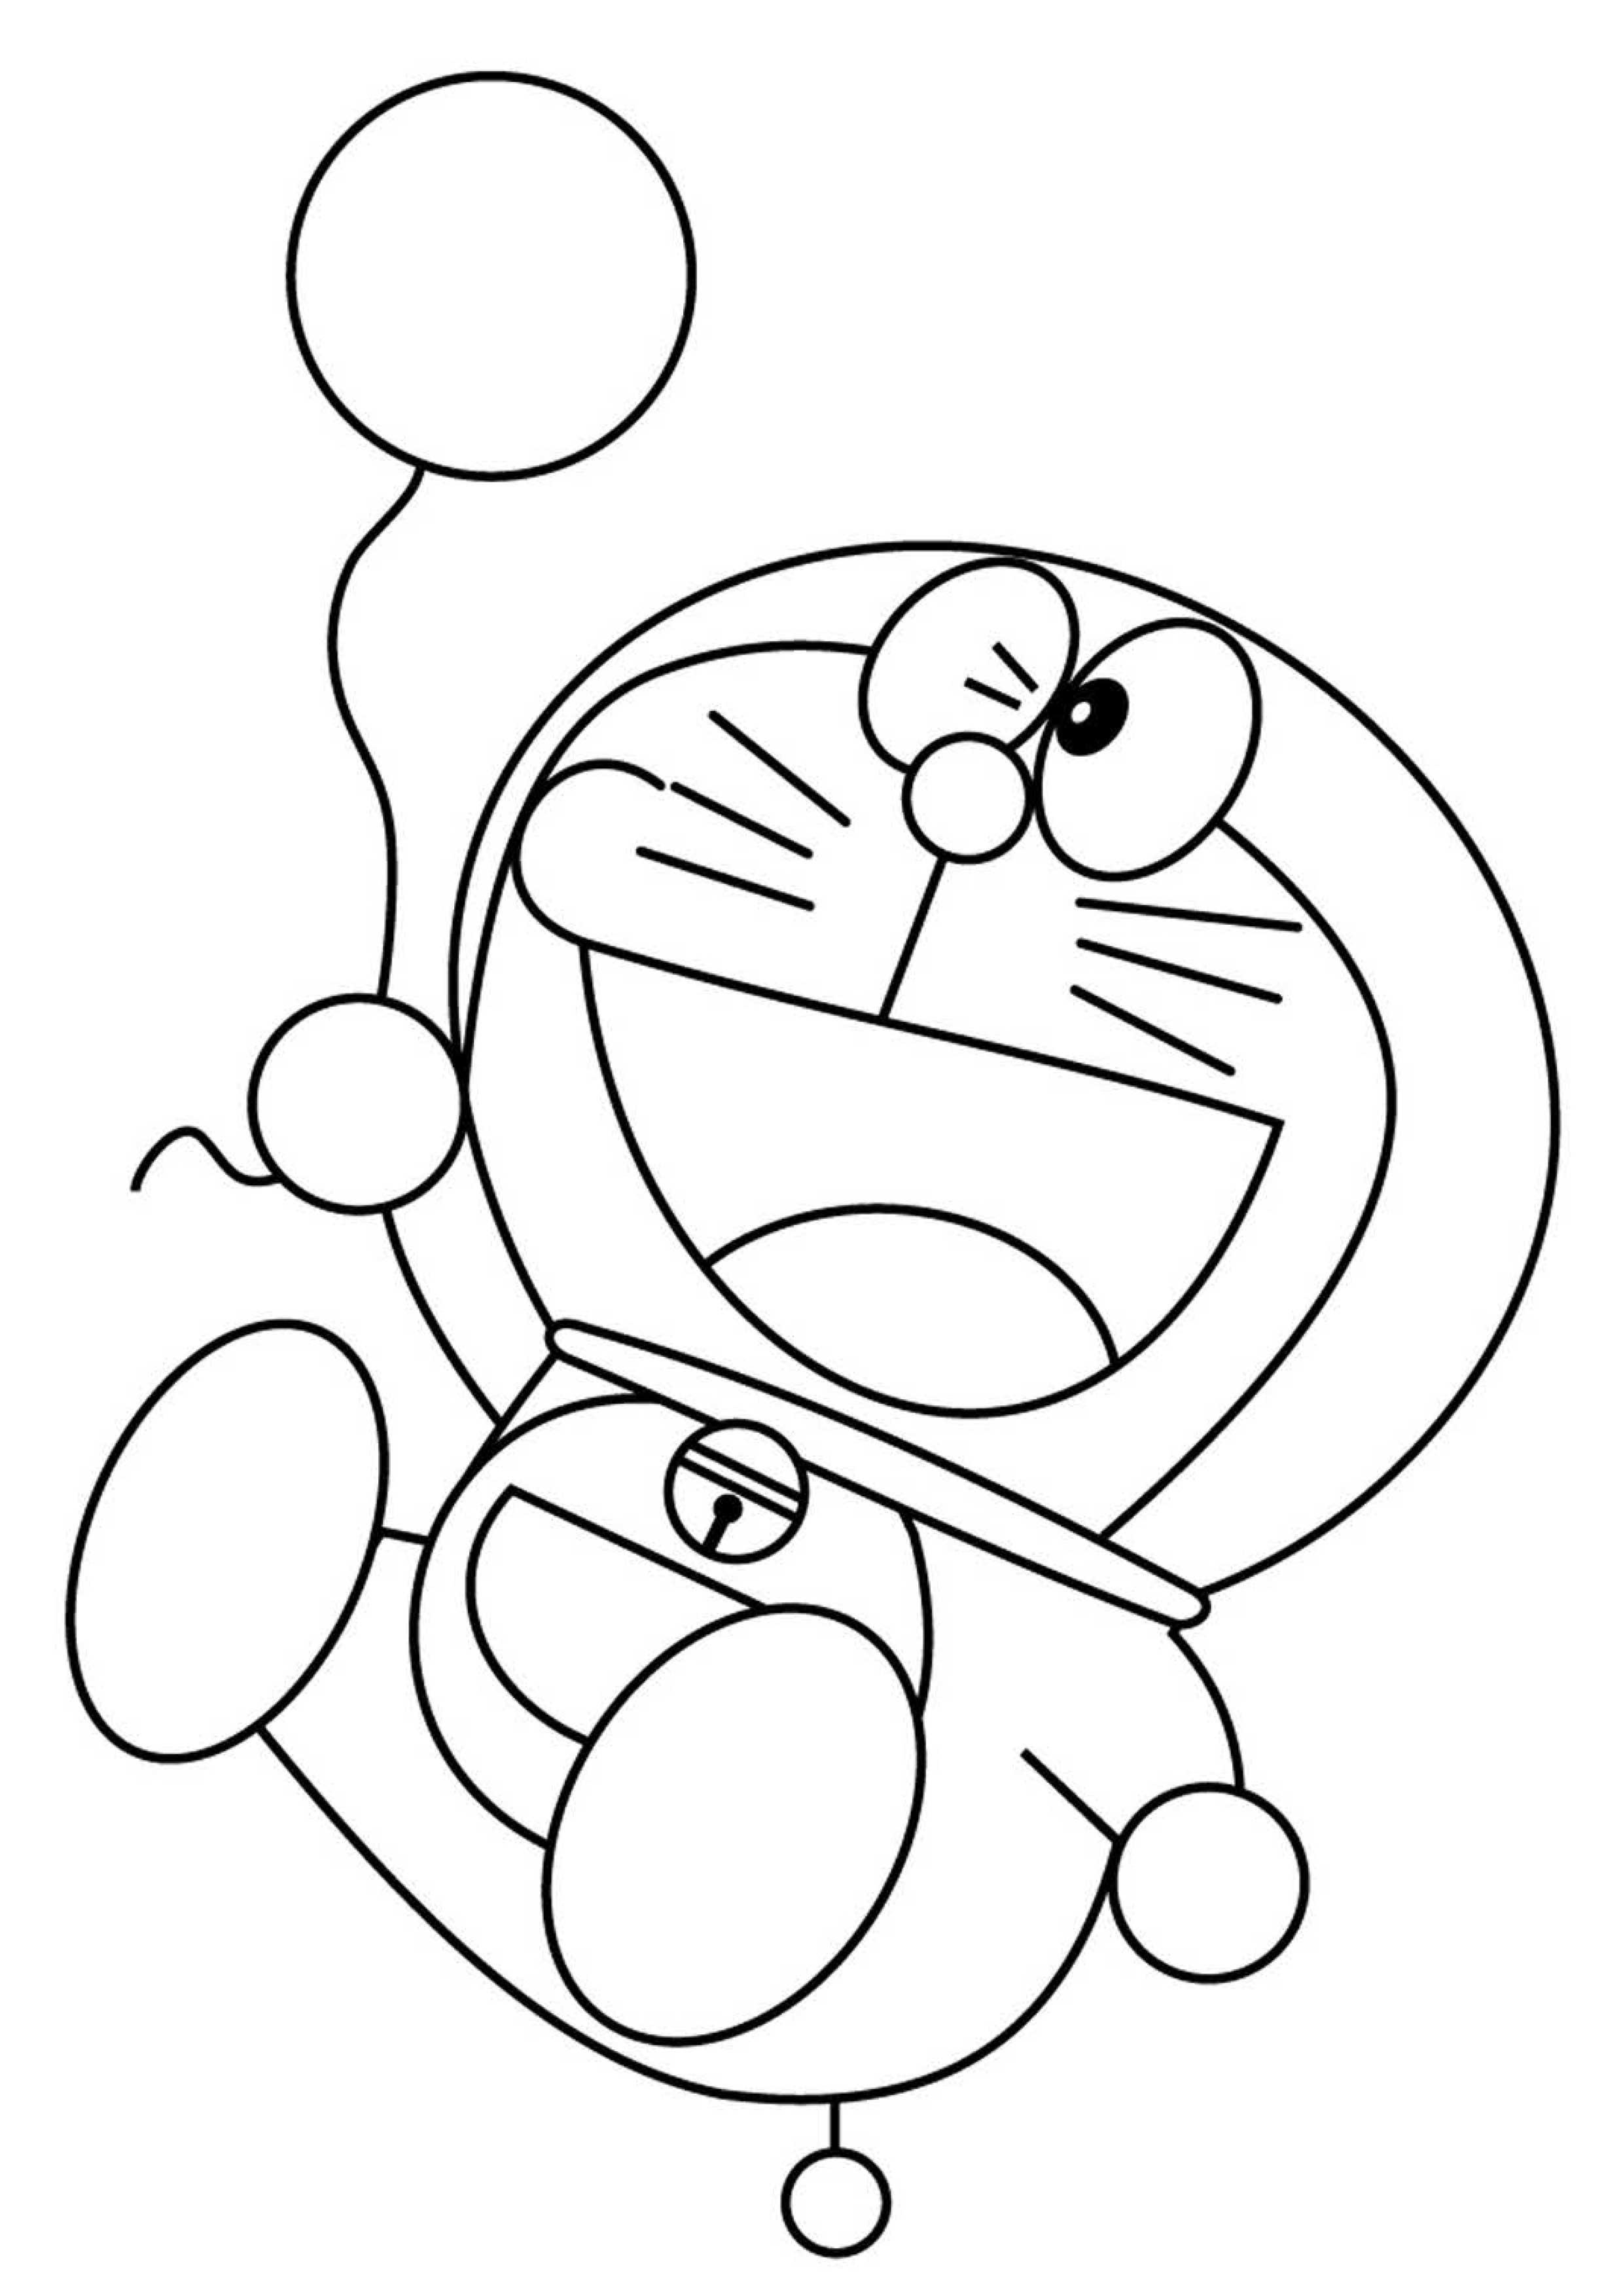 Doraemon-09